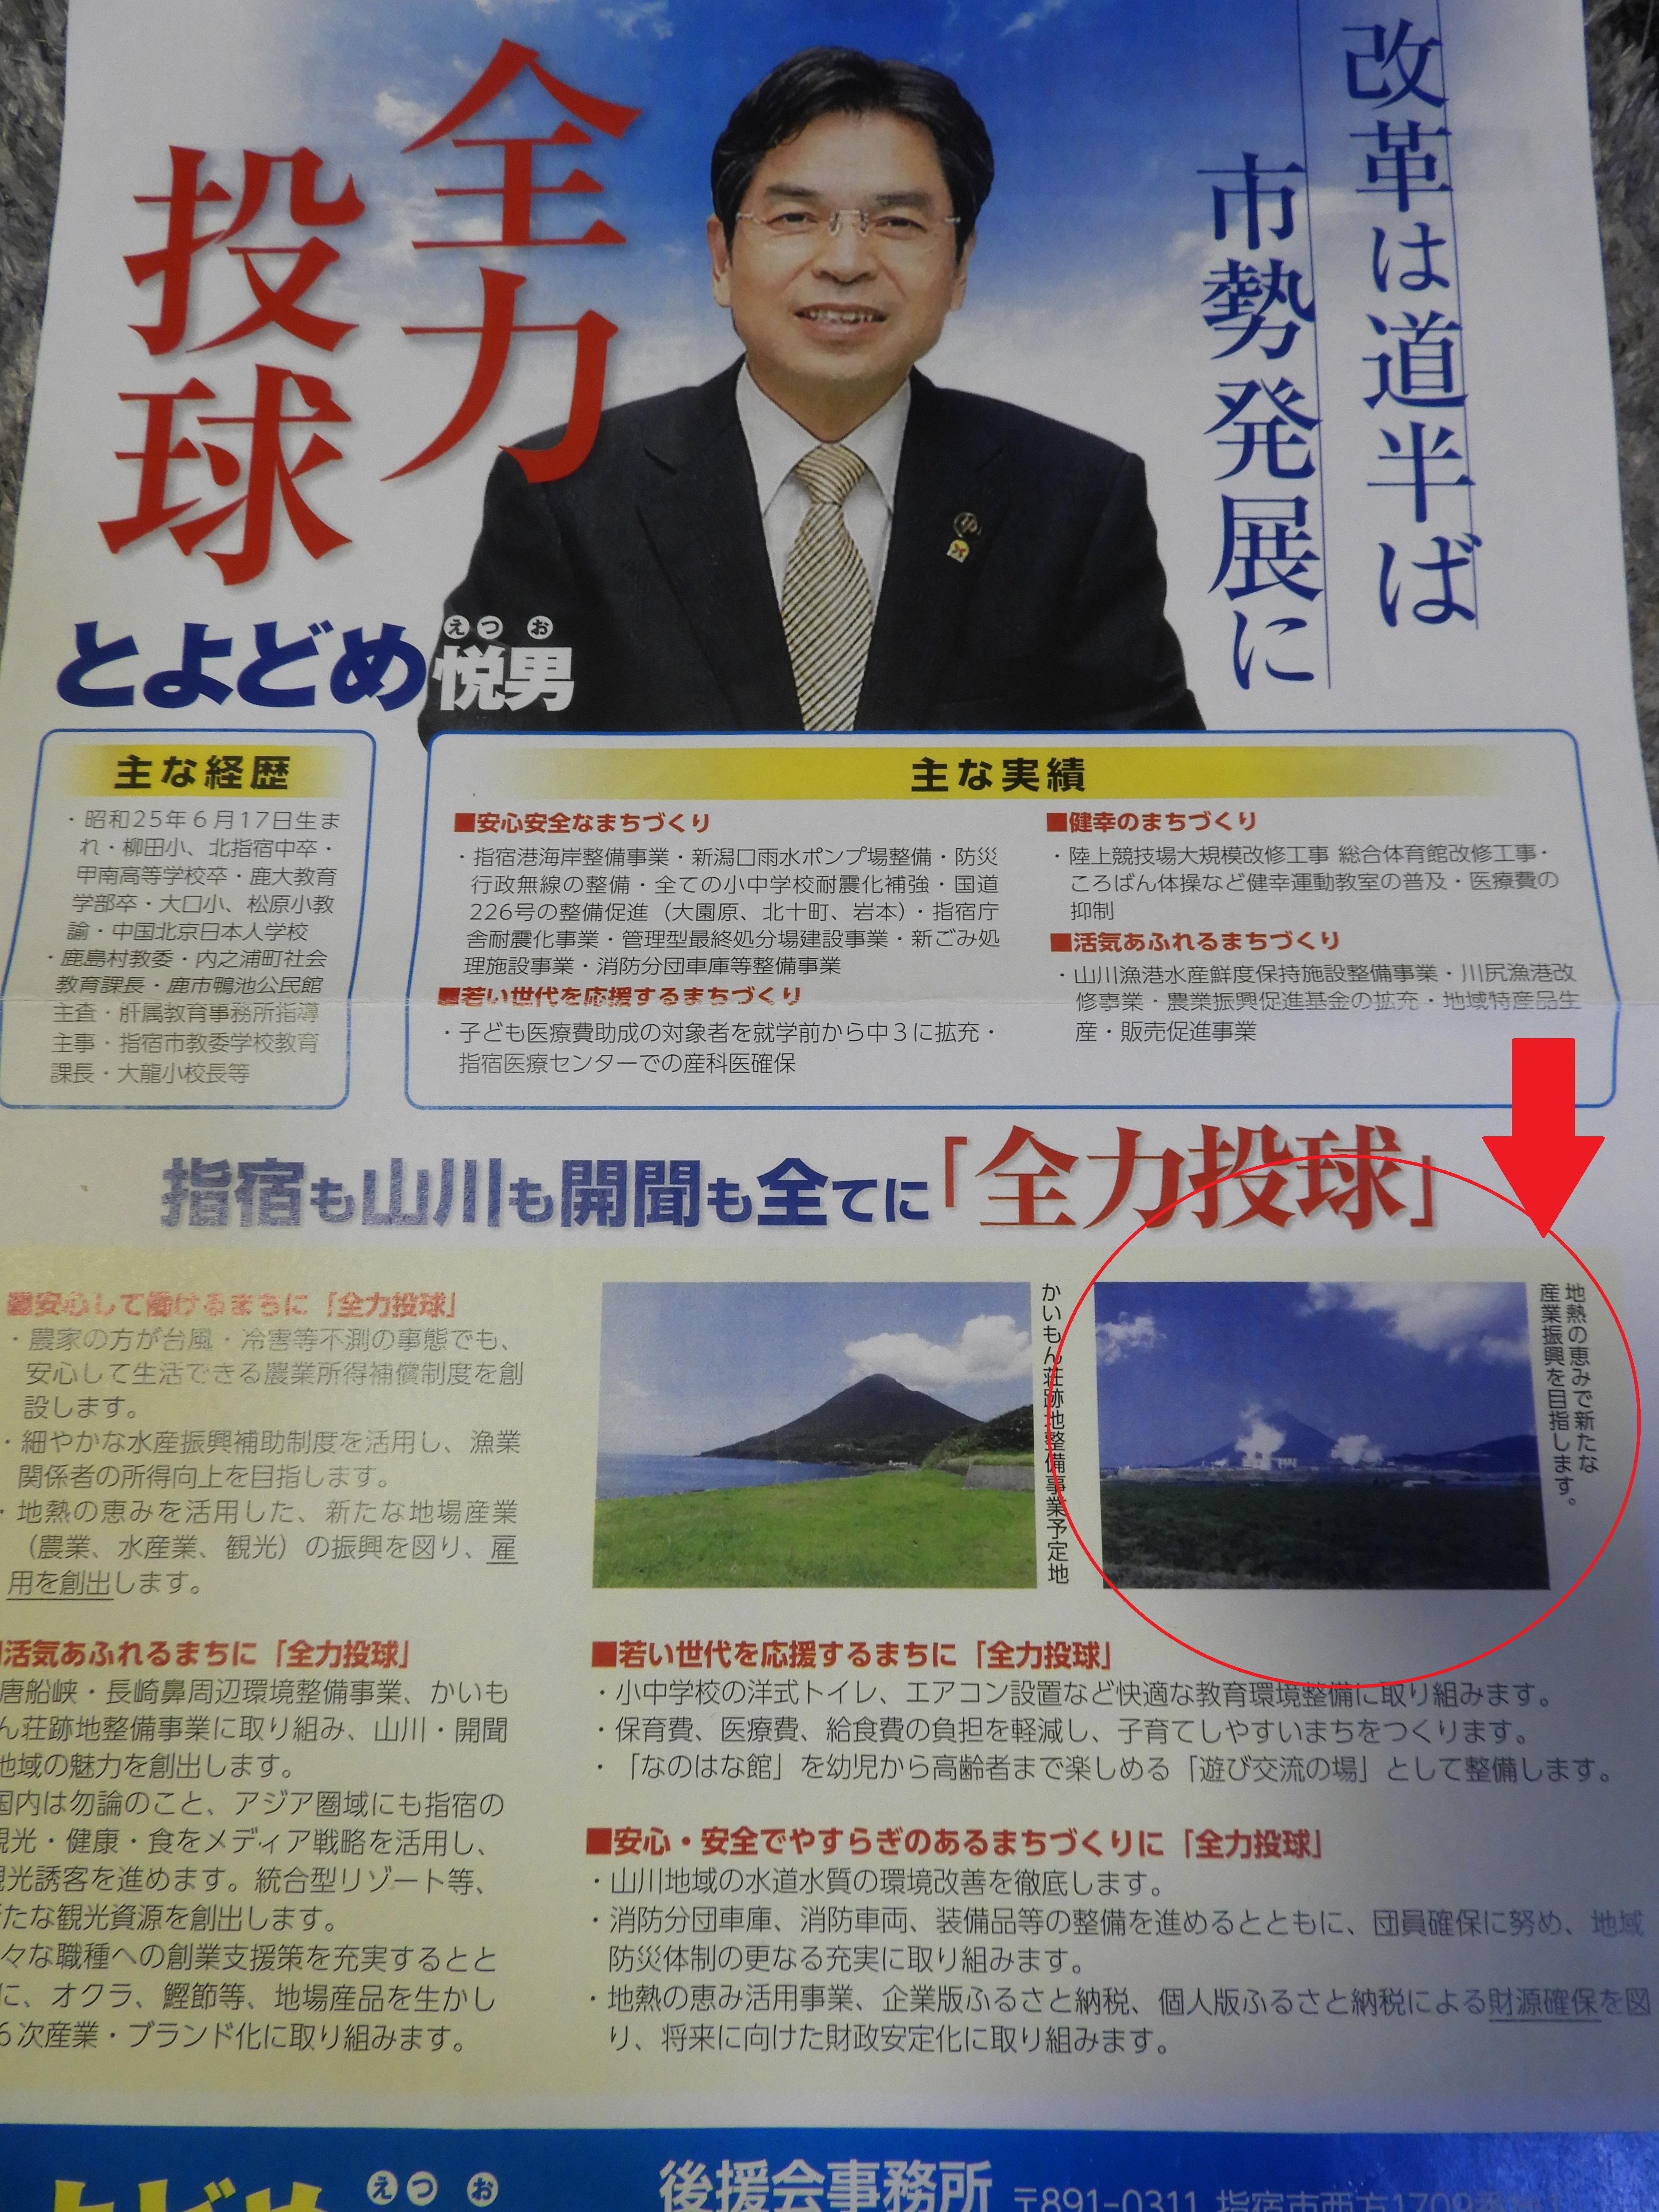 http://hunter-investigate.jp/news/1a63434e6419ba597e3e2dd42f5015ccf2a284b5.JPG